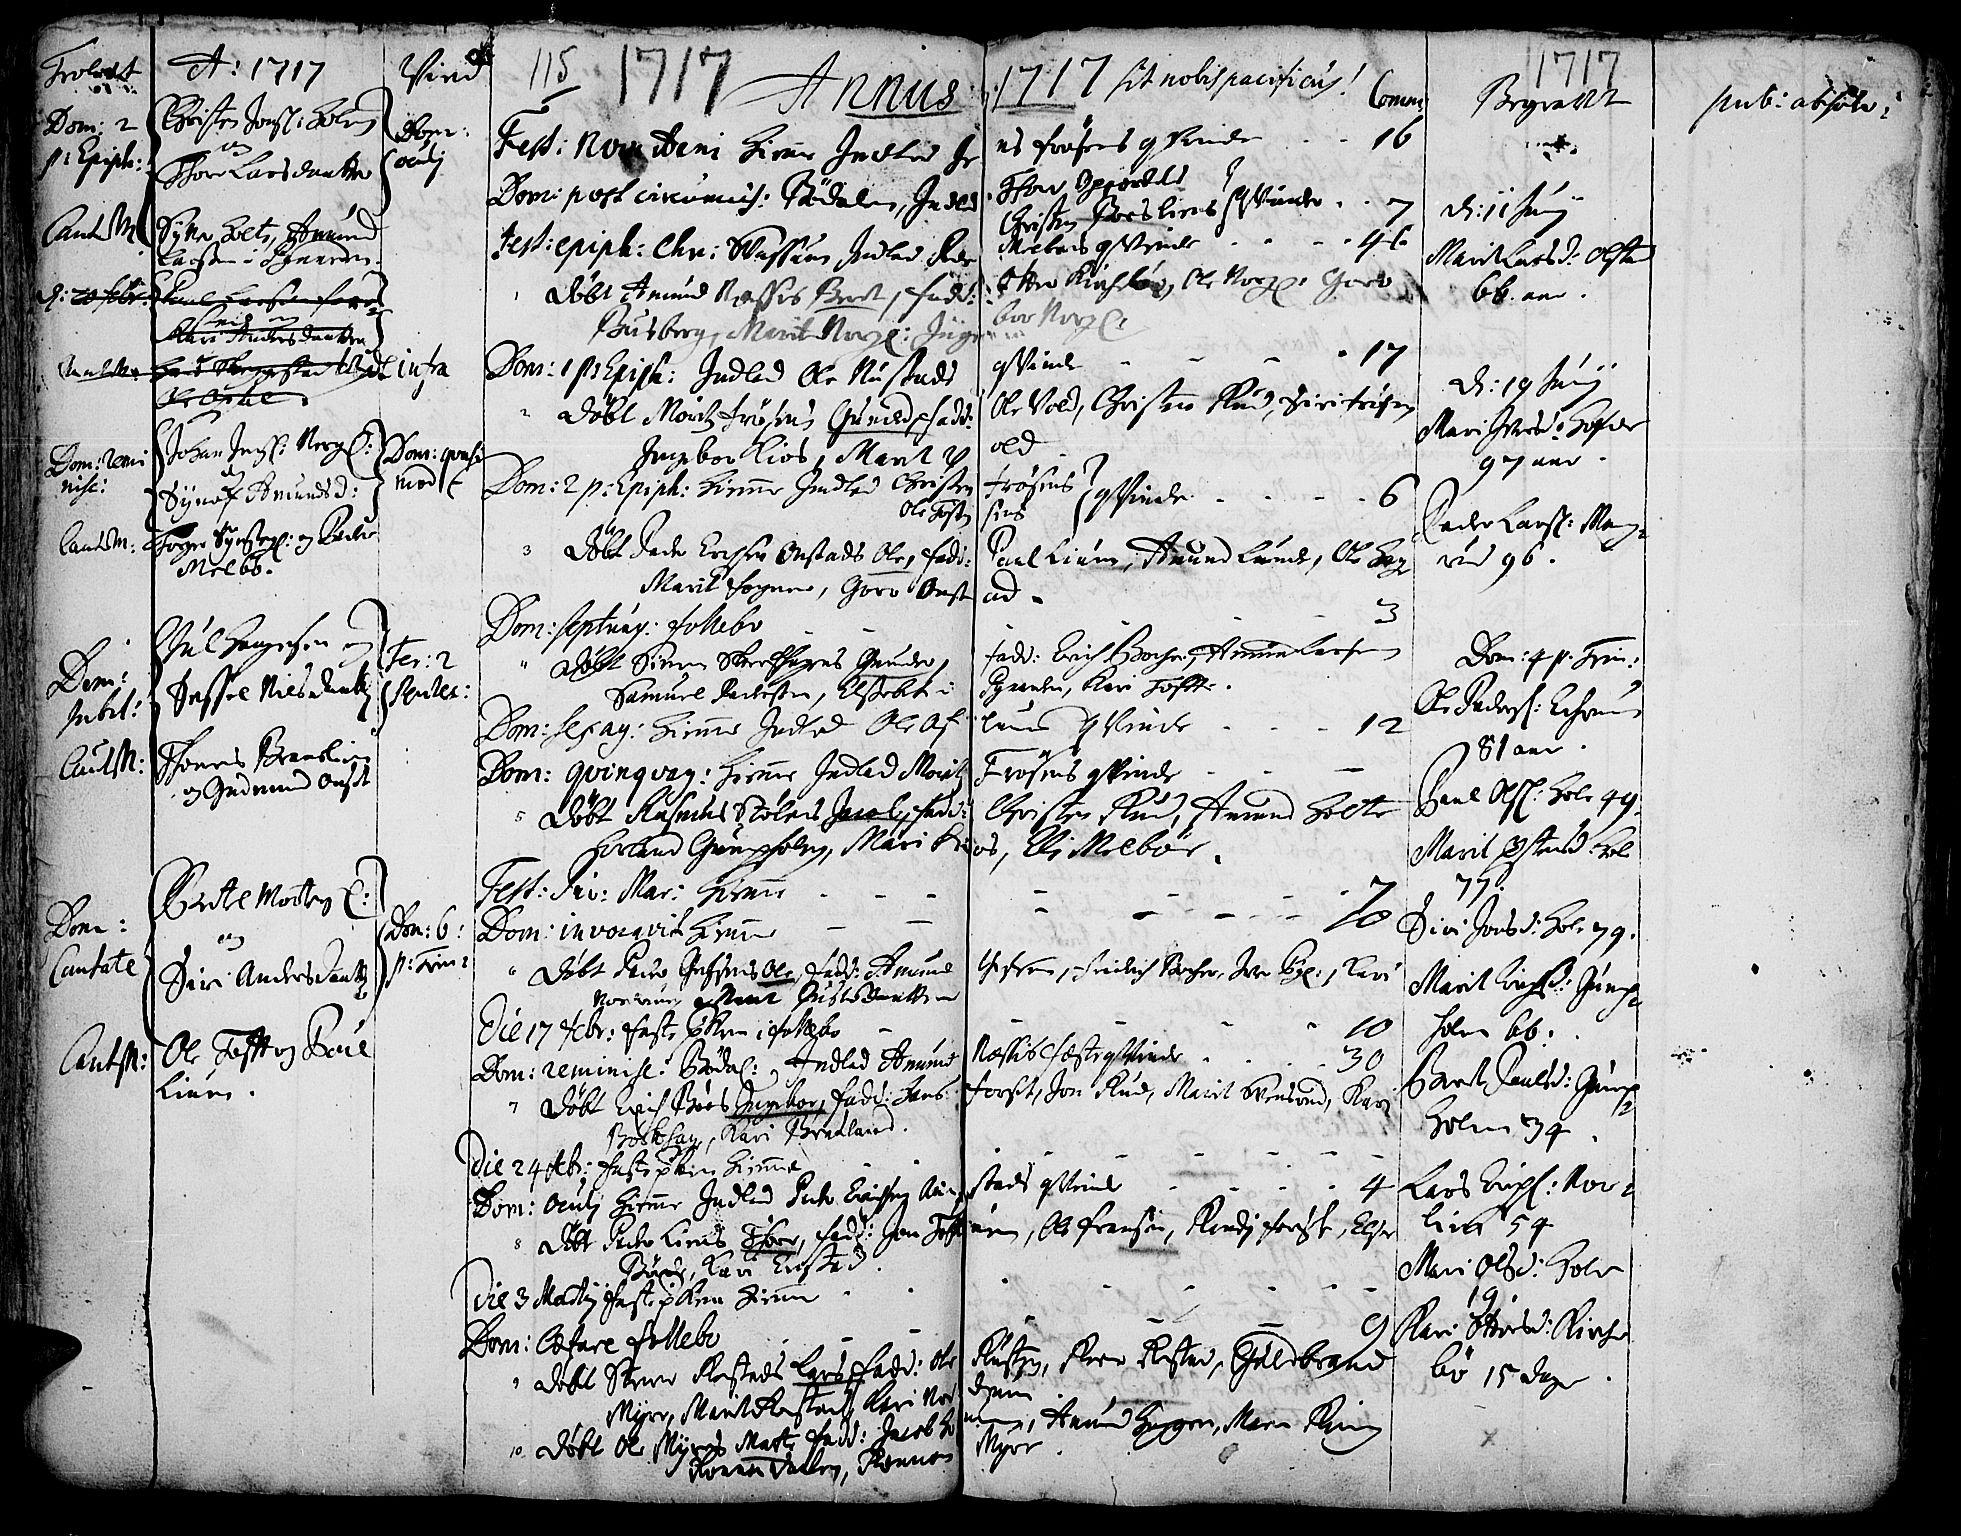 SAH, Gausdal prestekontor, Ministerialbok nr. 1, 1693-1728, s. 115